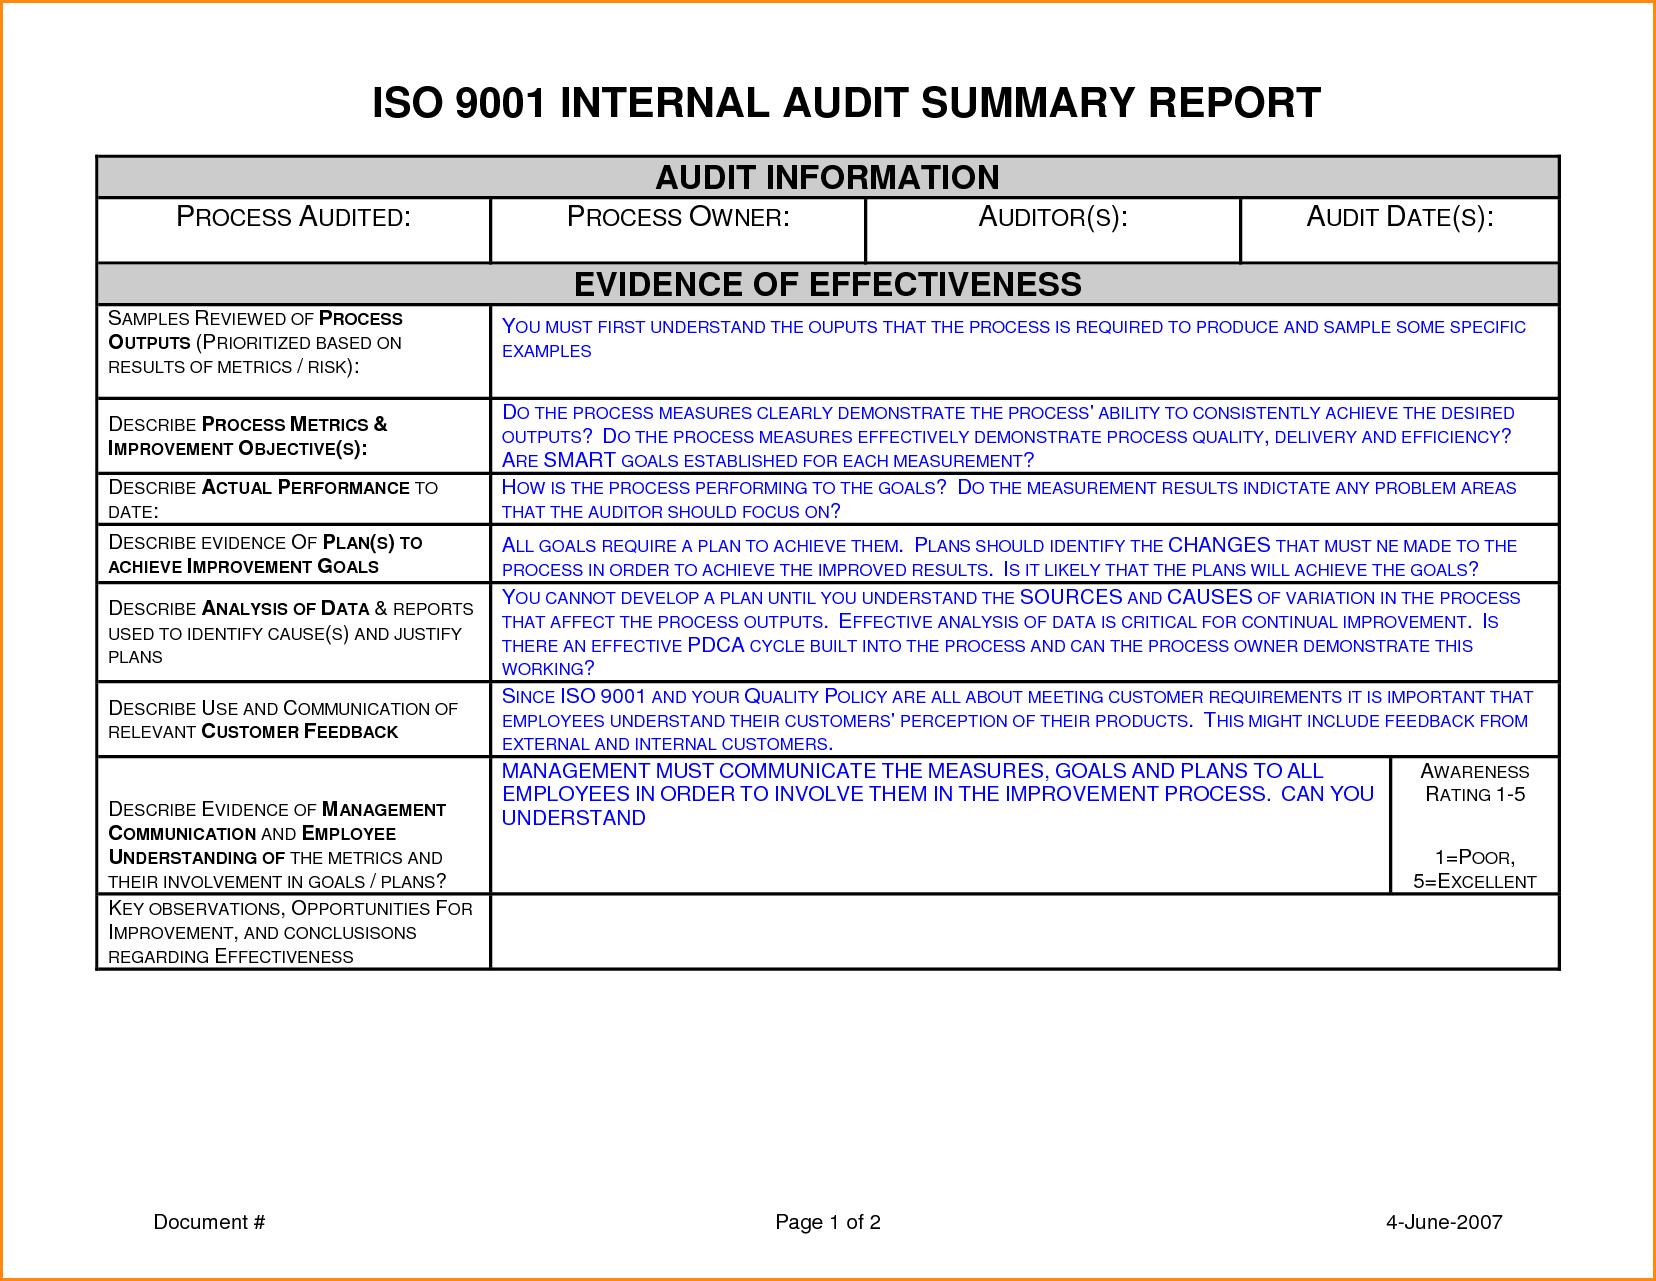 012 Template Ideas Internal Audit Report Sample Unbelievable Intended For Iso 9001 Internal Audit Report Template